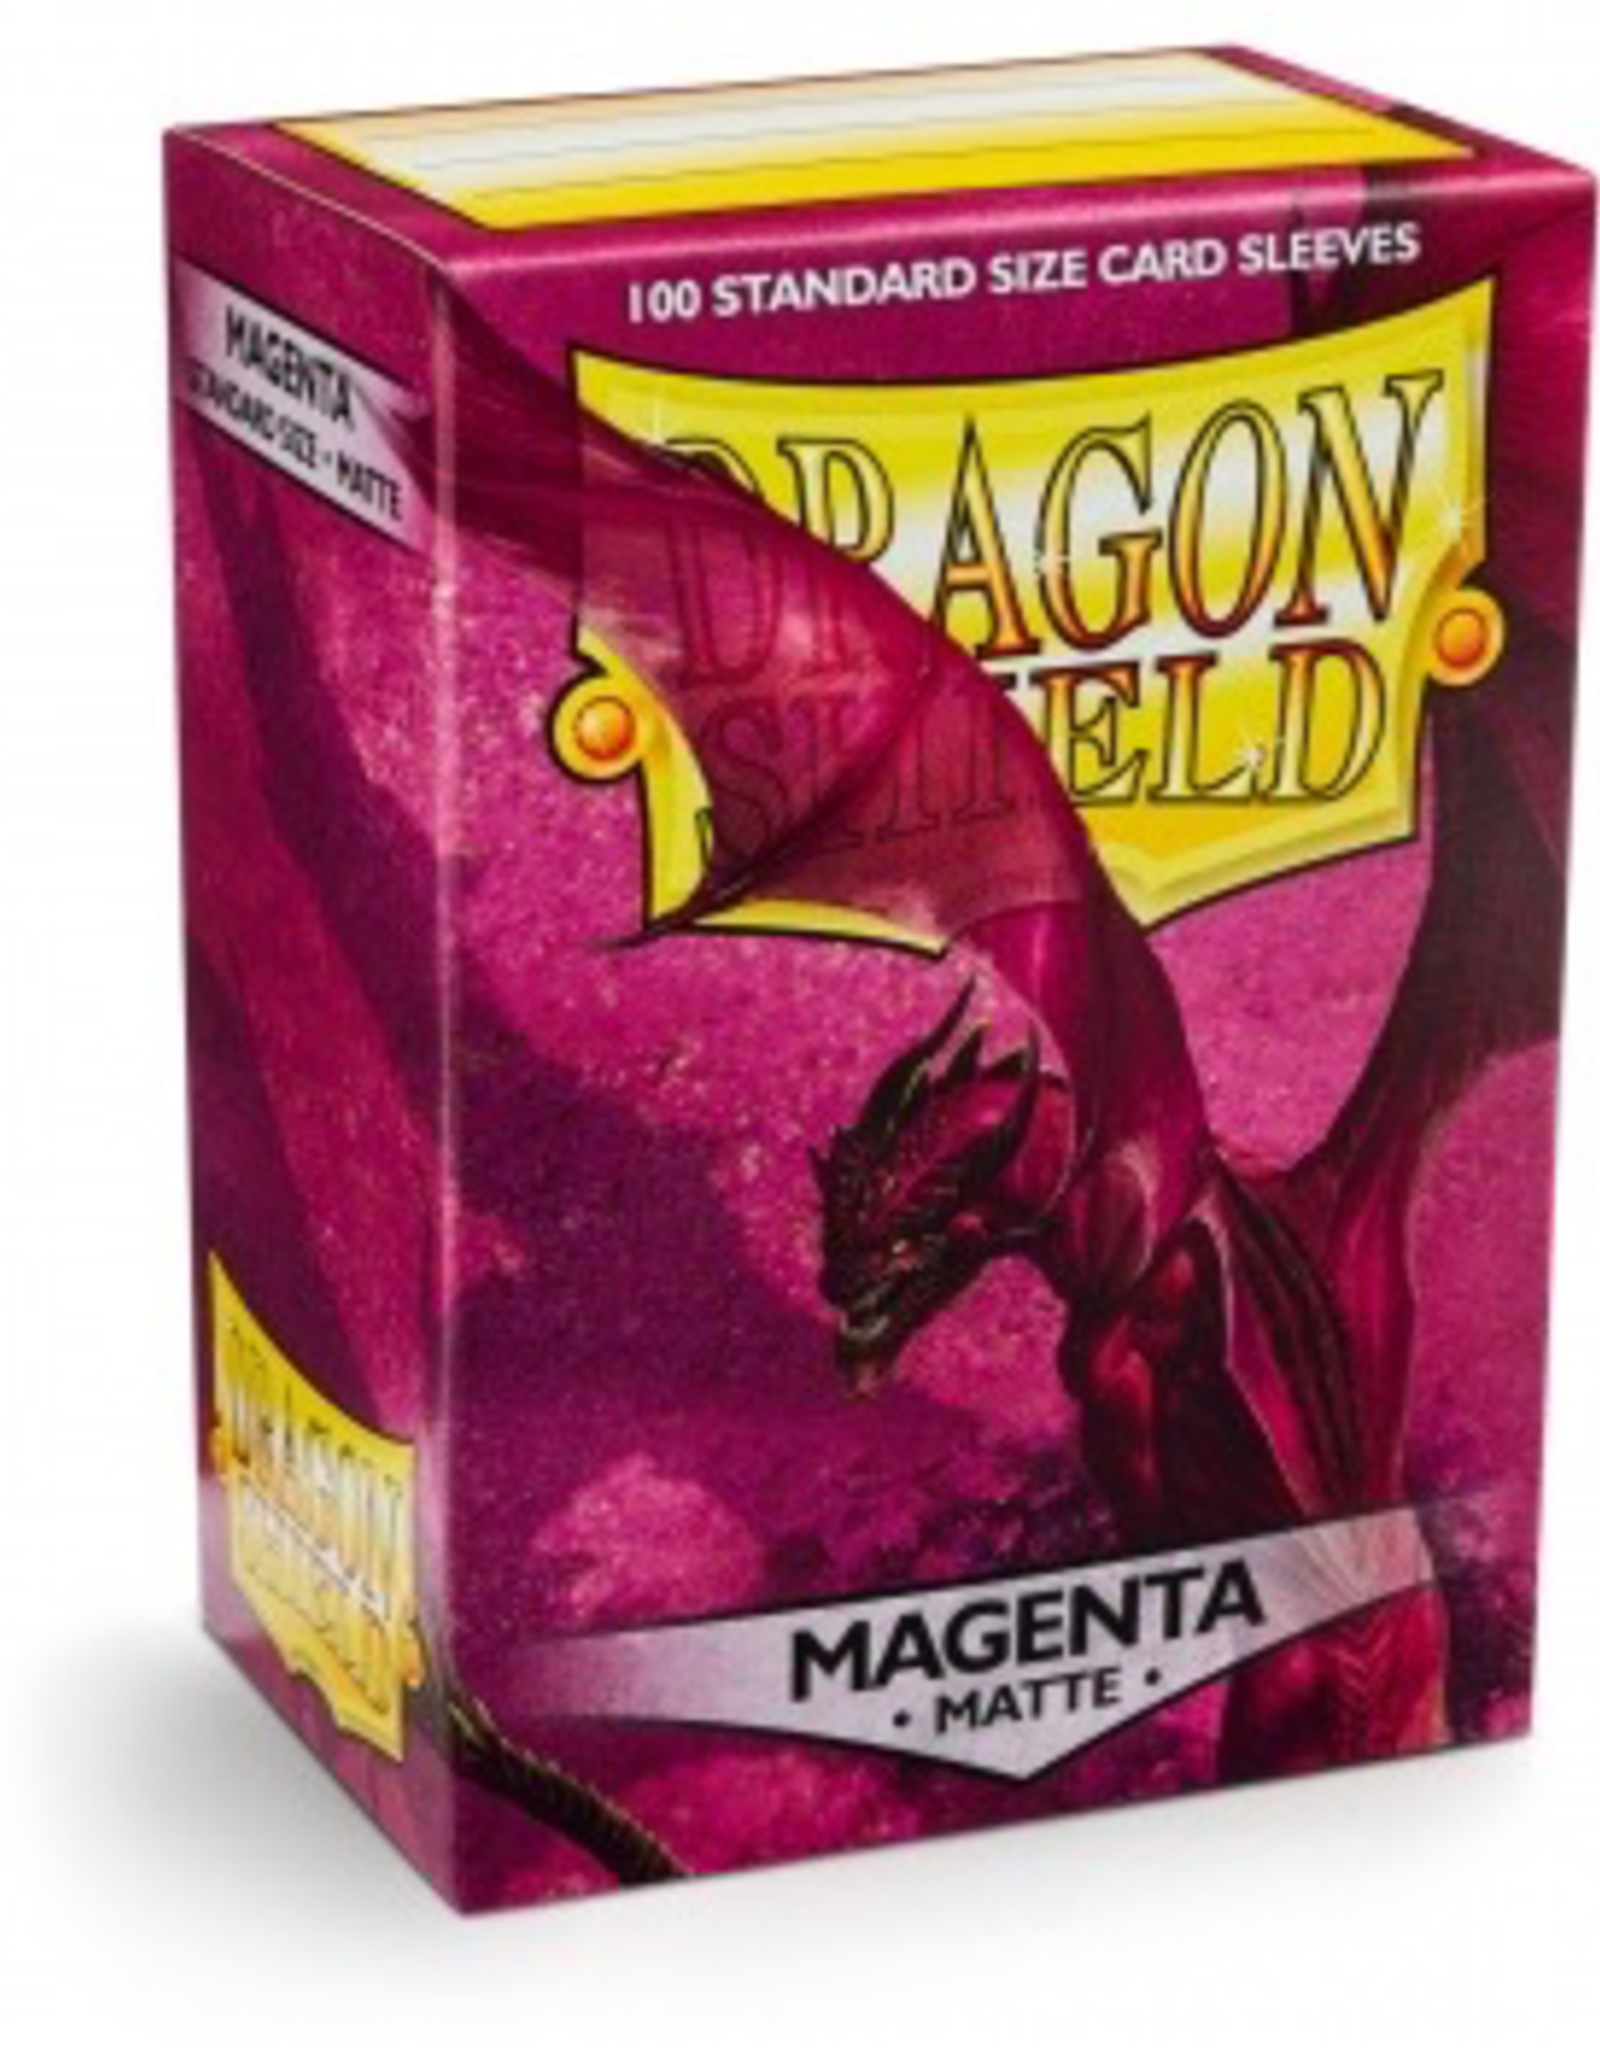 DS - Small Sleeves Dragon Shield Standard Sleeves - Matte Magenta (100 Sleeves)